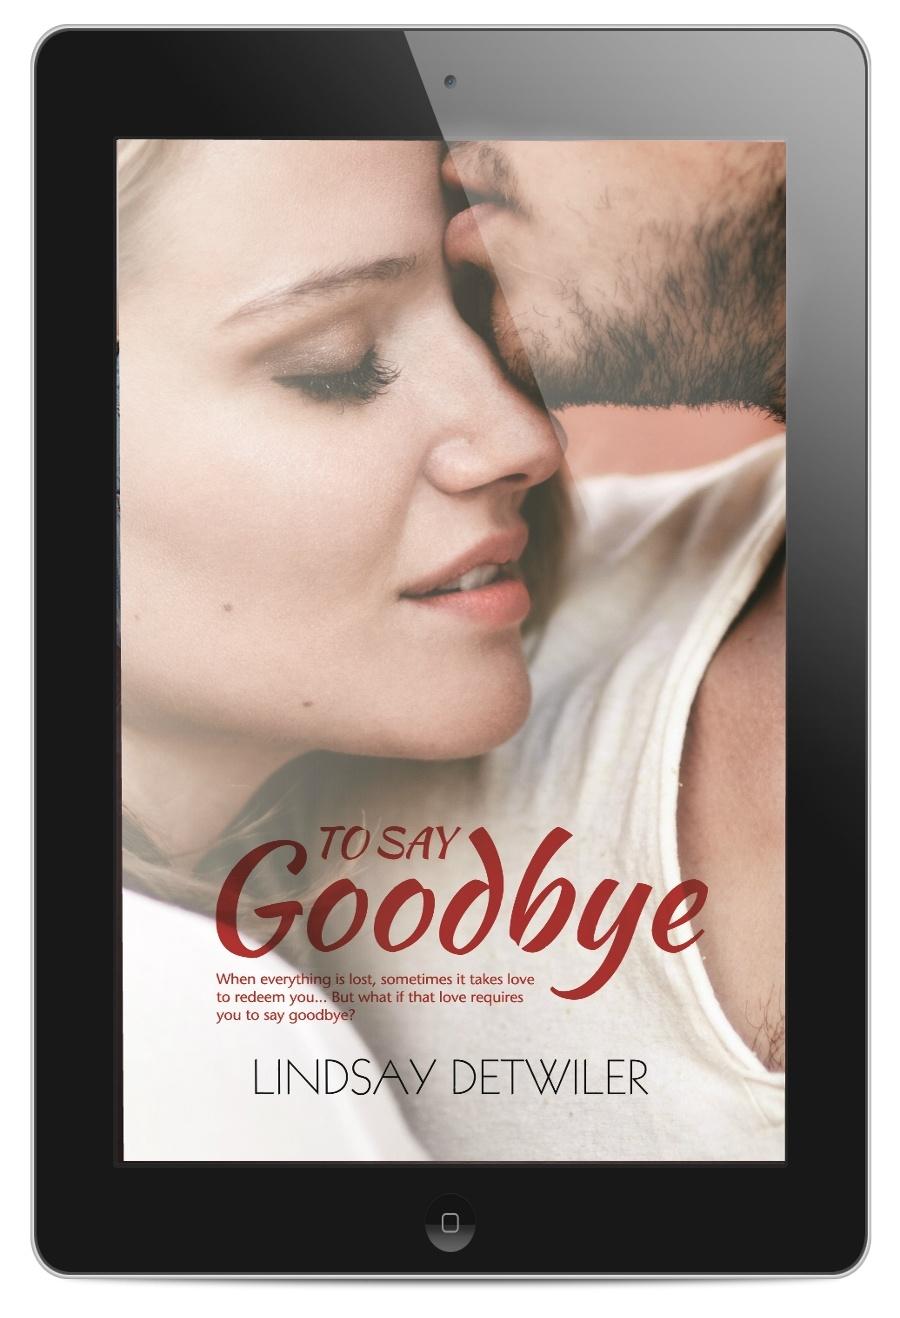 EPUB To Say Goodbye by Lindsay Detwiler